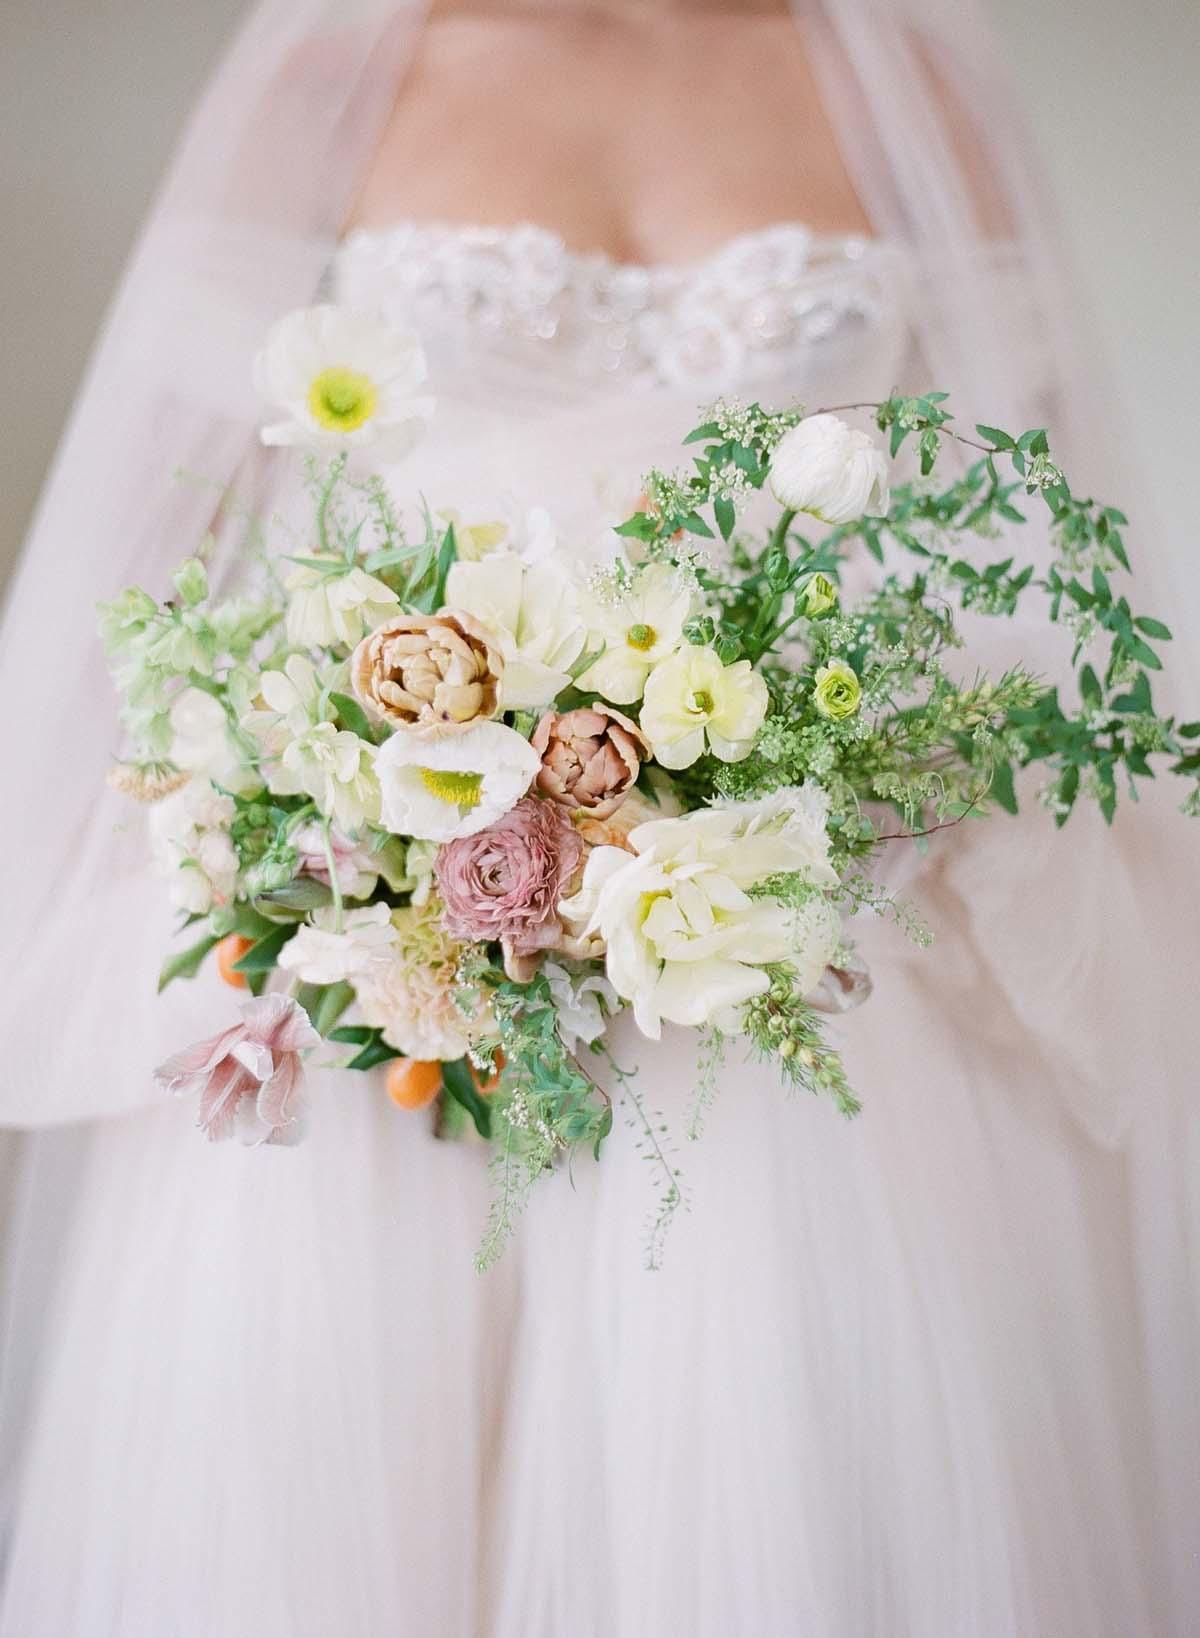 XOXO_BRIDE_Events-Michelle-Beller_Photography_0149